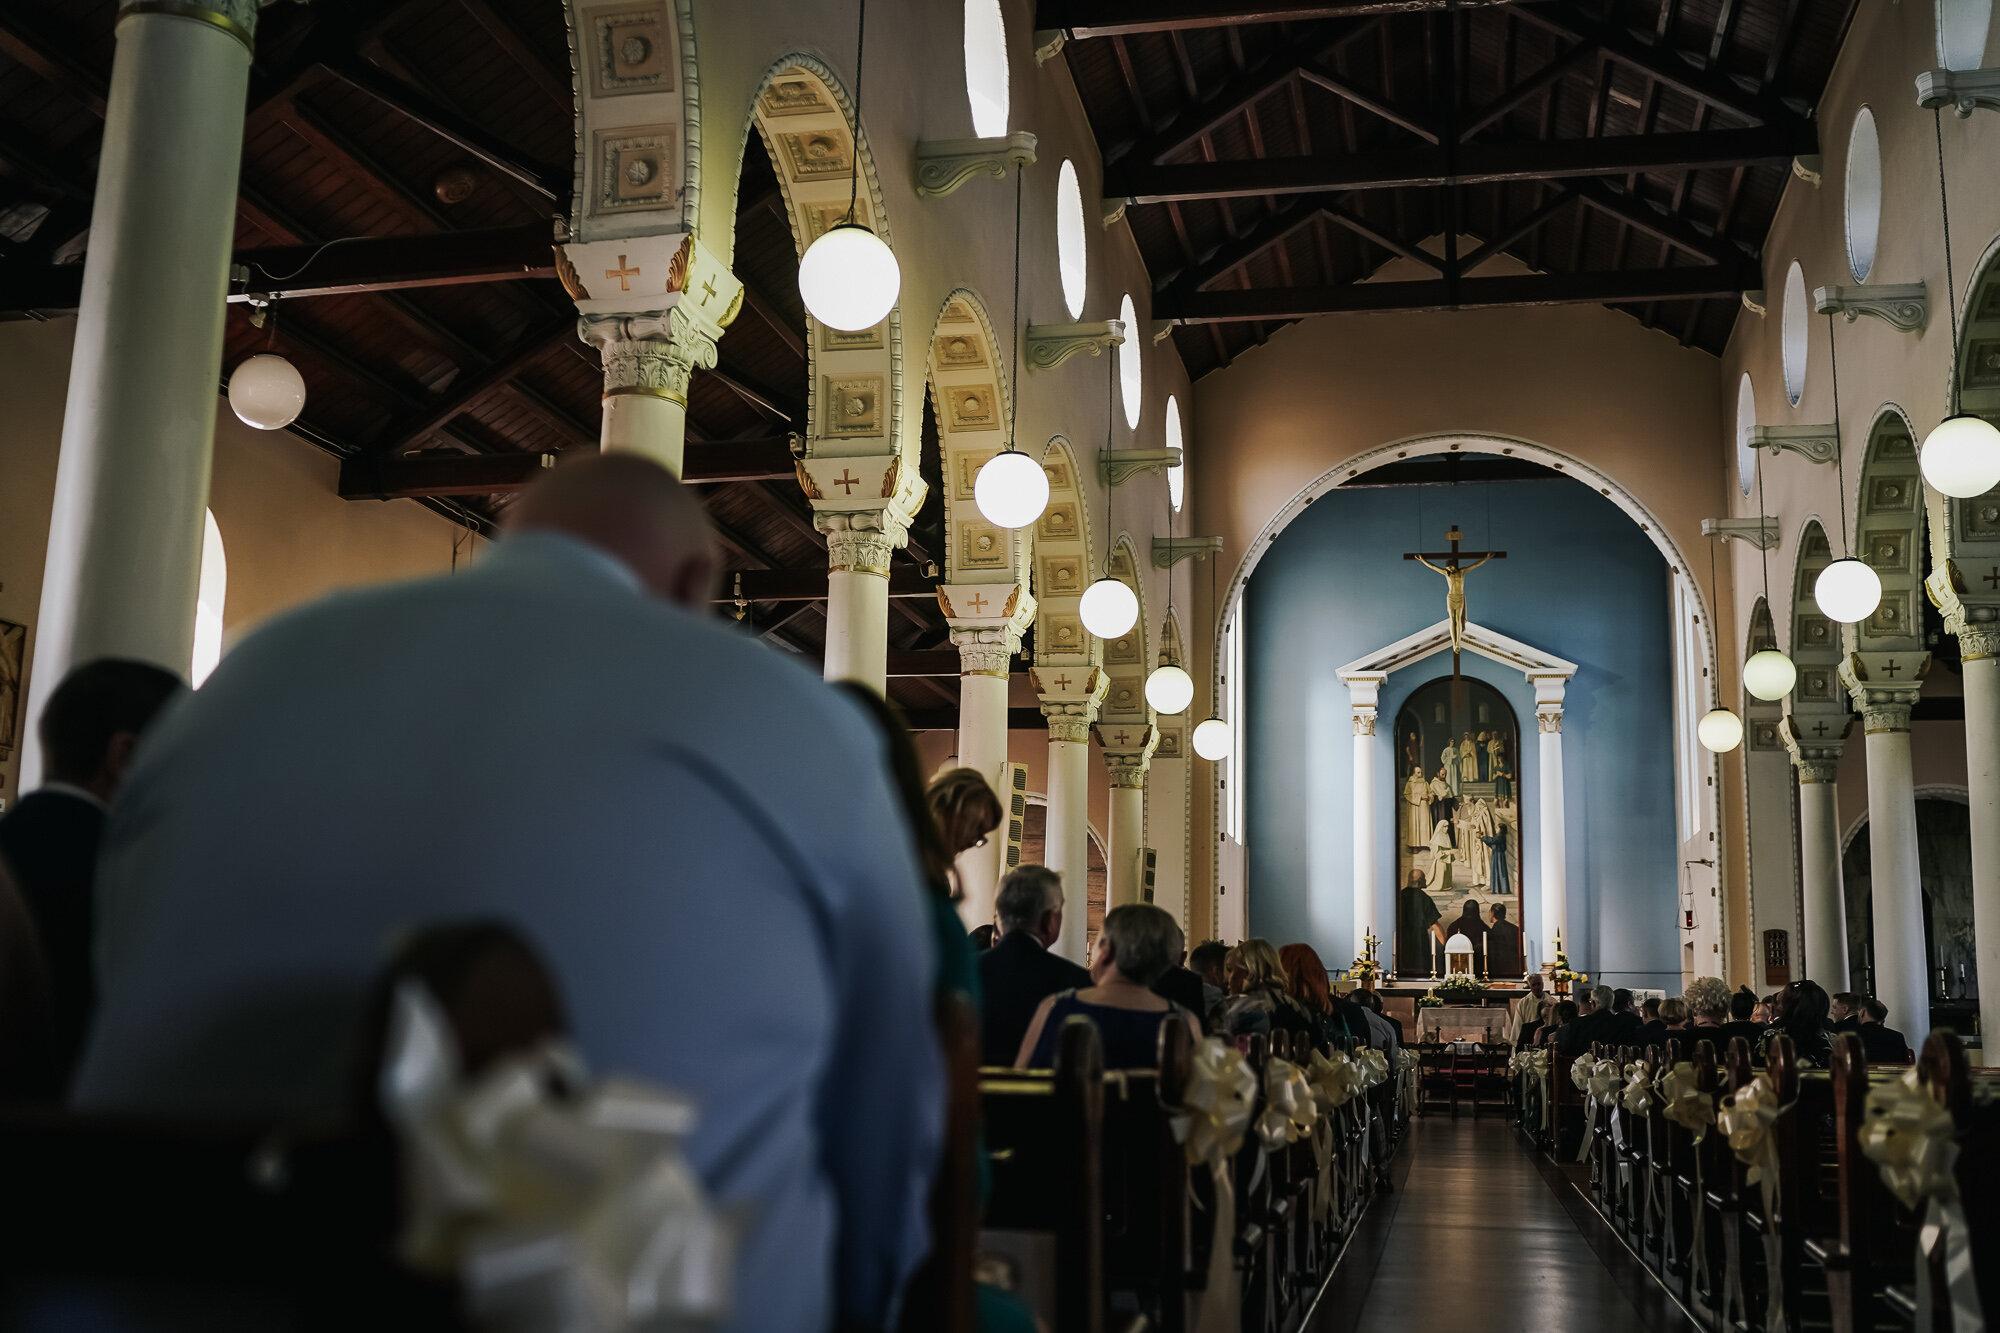 Clontarf Caste wedding photographer Wedding Photography dublin ireland wedding photographer (19 of 58).jpg